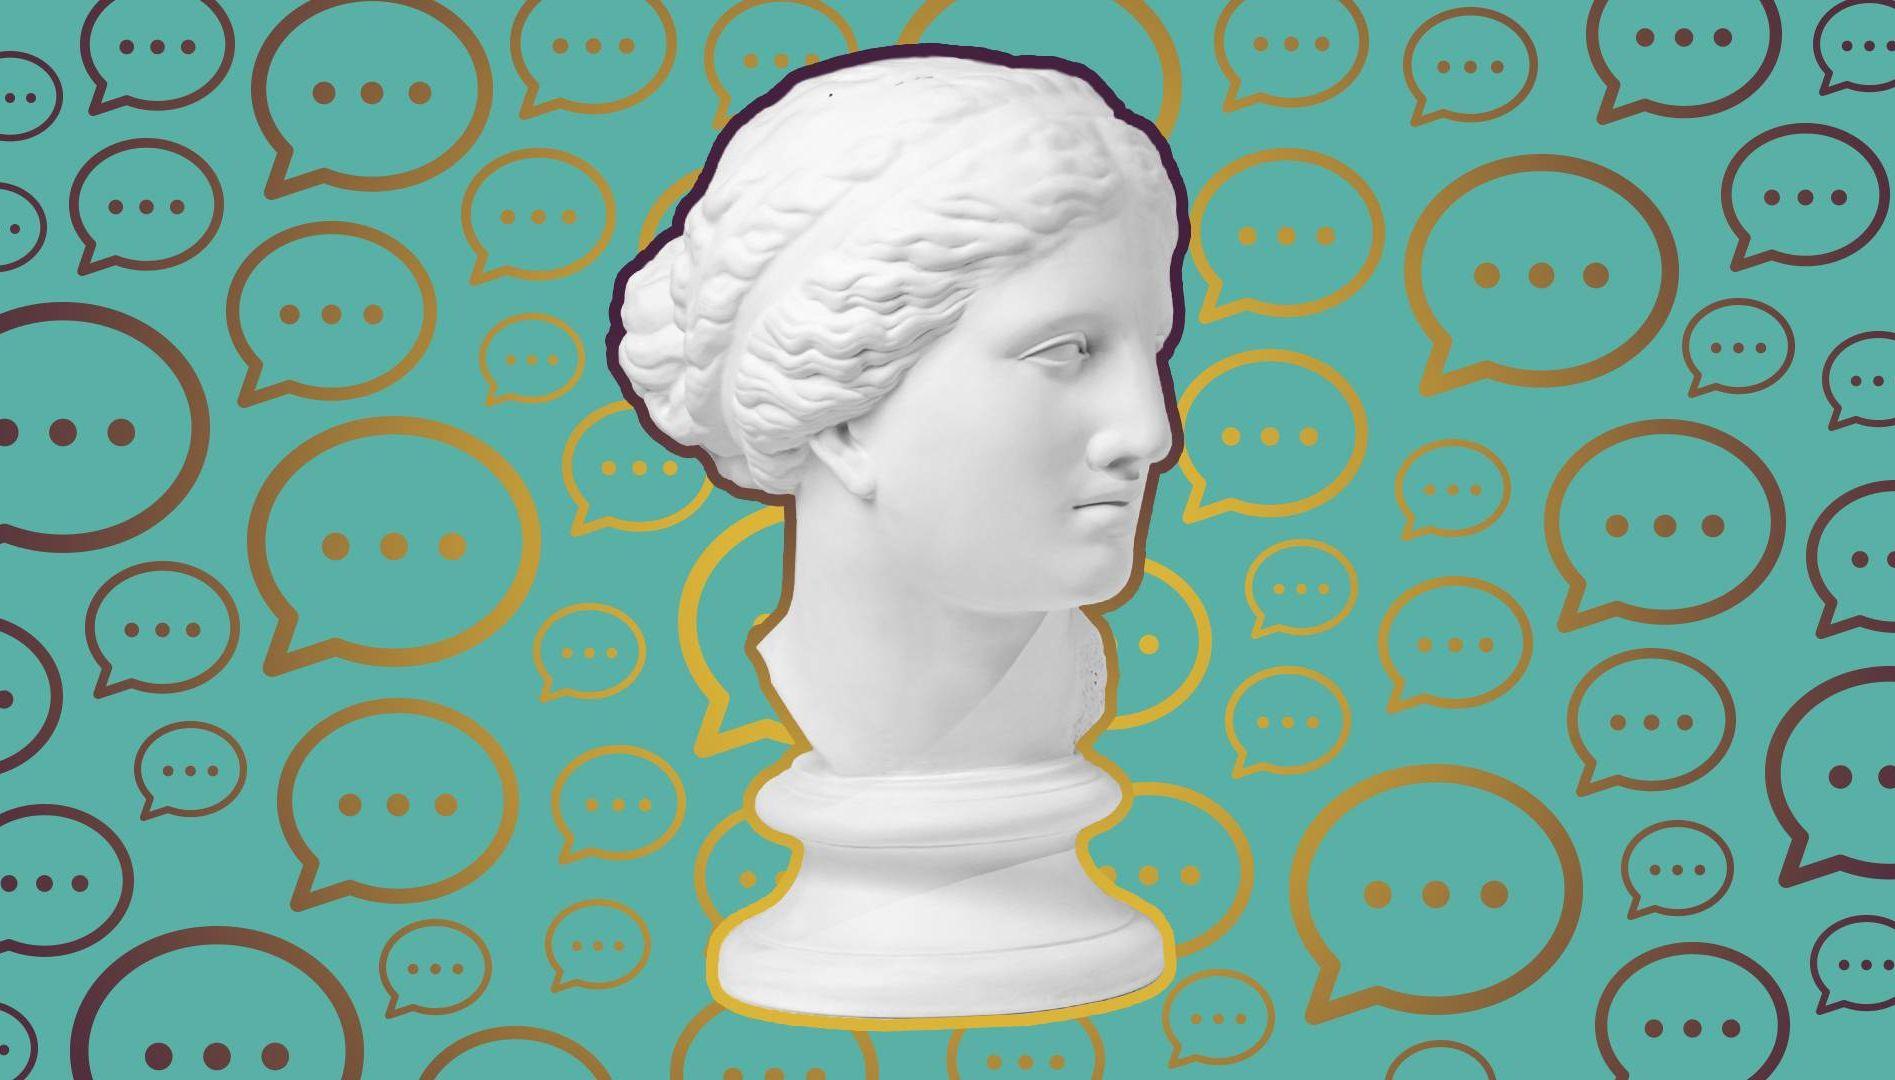 a statue head. Rewire pbs love post-pandemic body